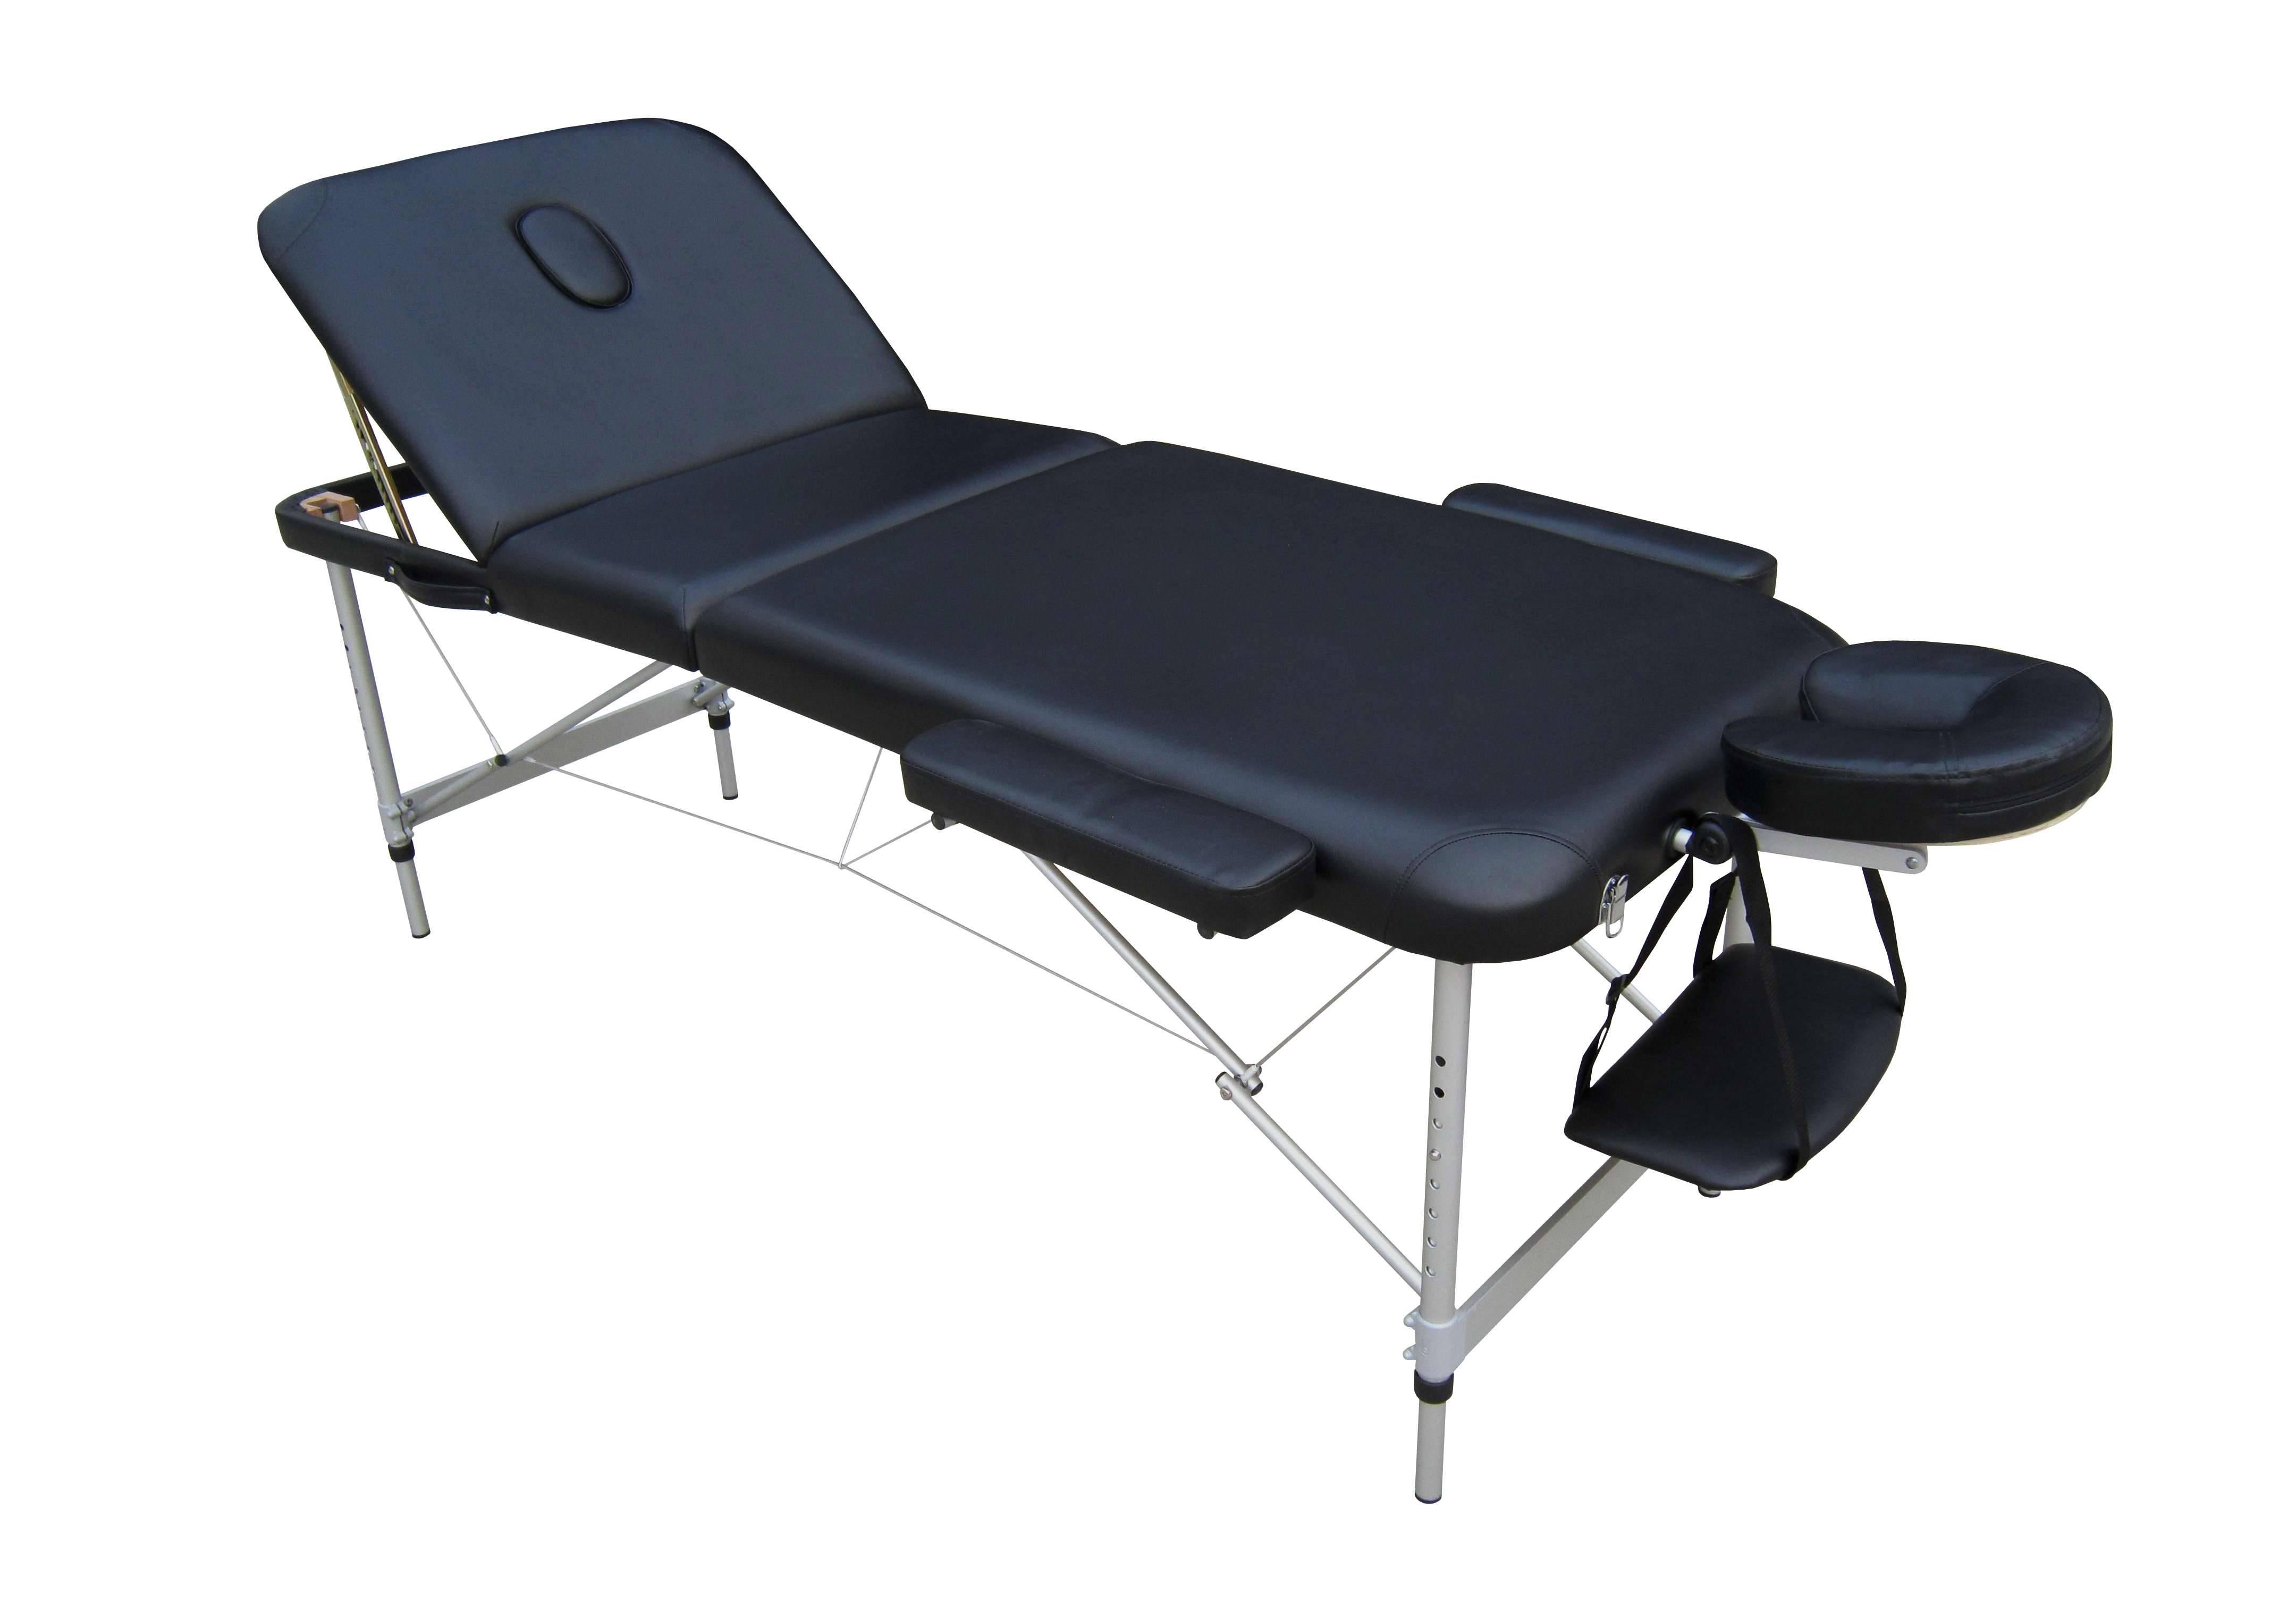 Aluminum massage table/ Massage bed/ Portable massage table/ Lightweight massage table/ folding mass